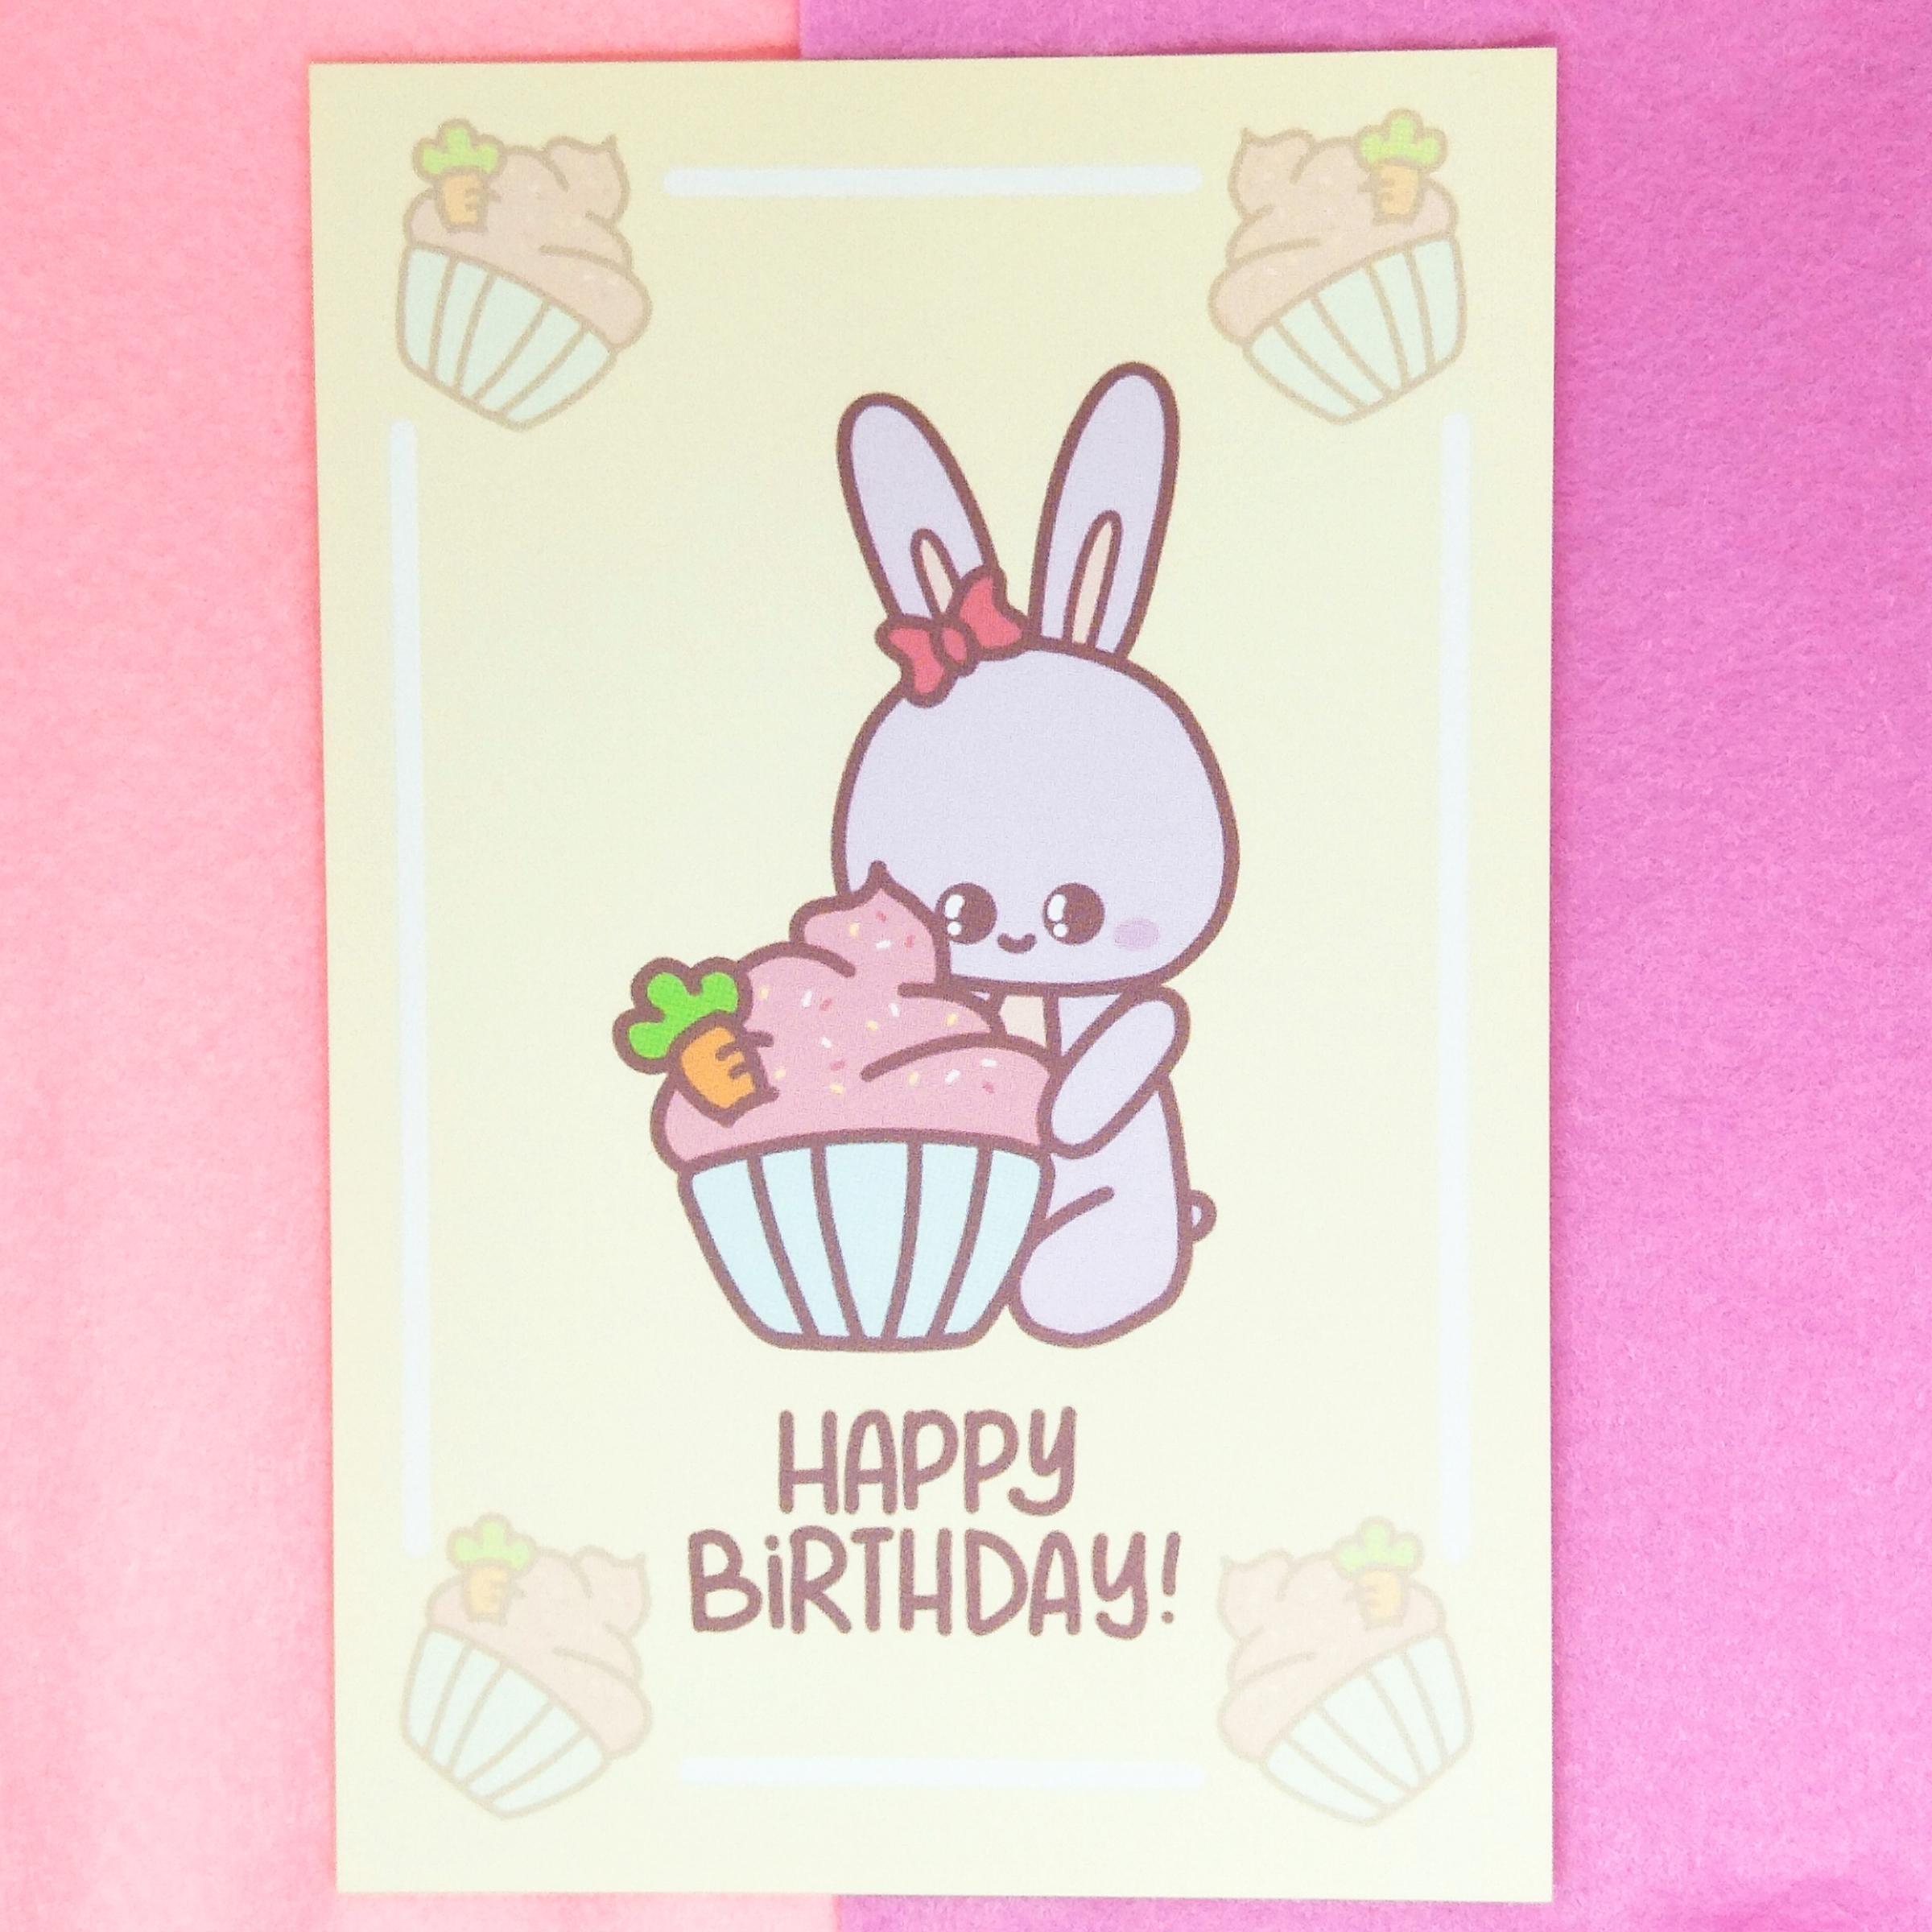 Happy Birthday Kiki Cupcake-Front.jpg